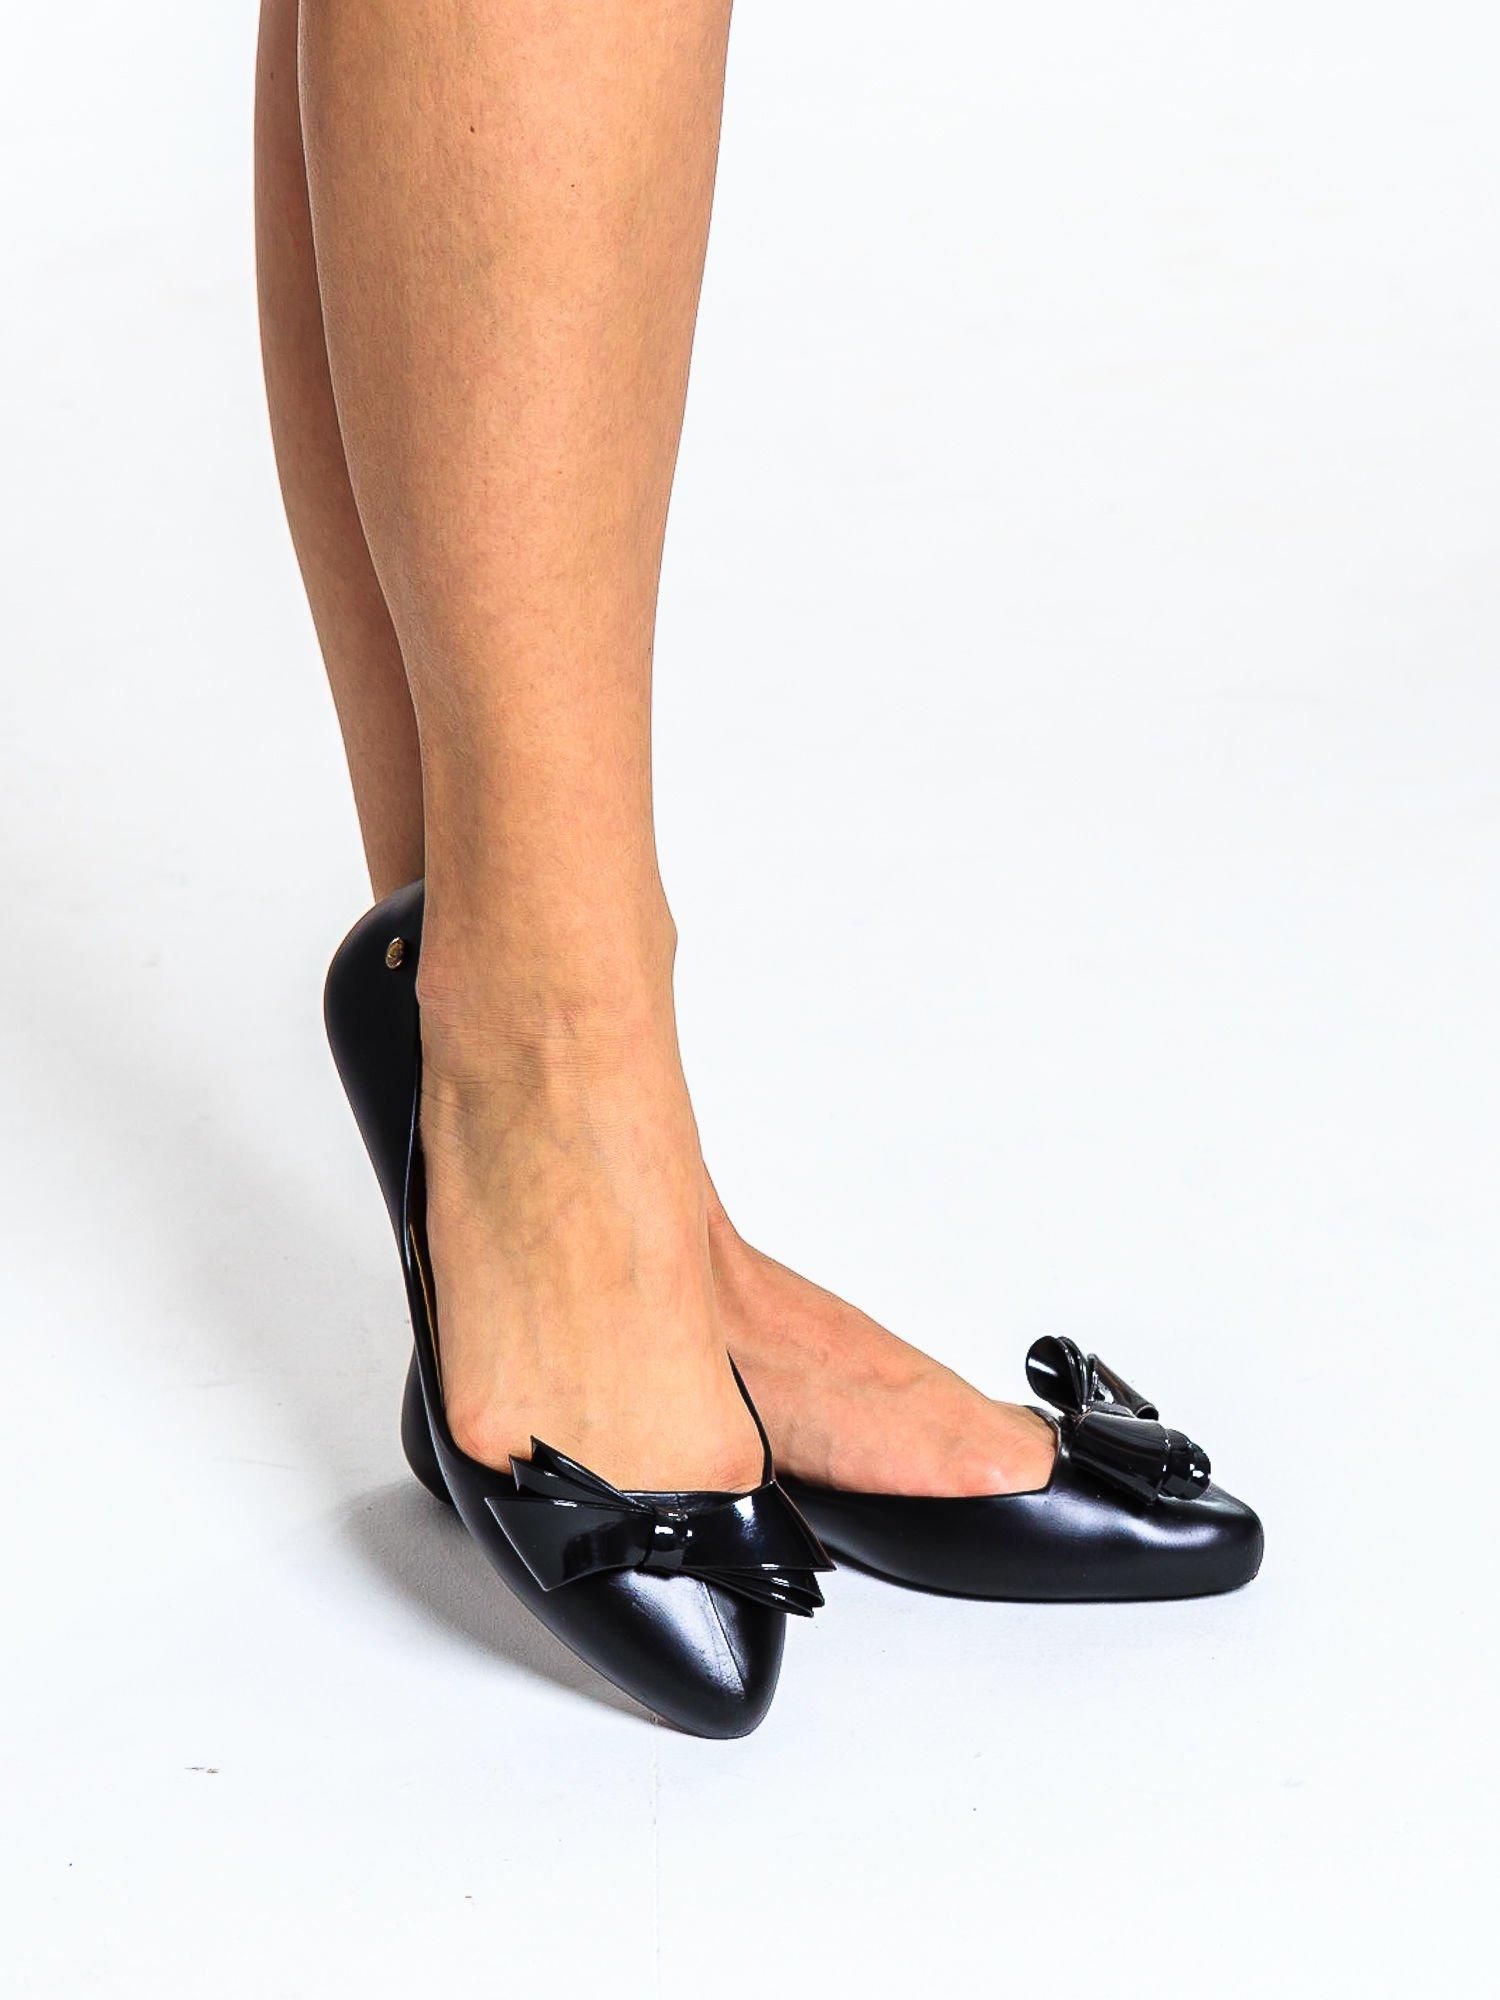 Czarne baleriny silicone Naomi gumowe z kokardą                                  zdj.                                  1